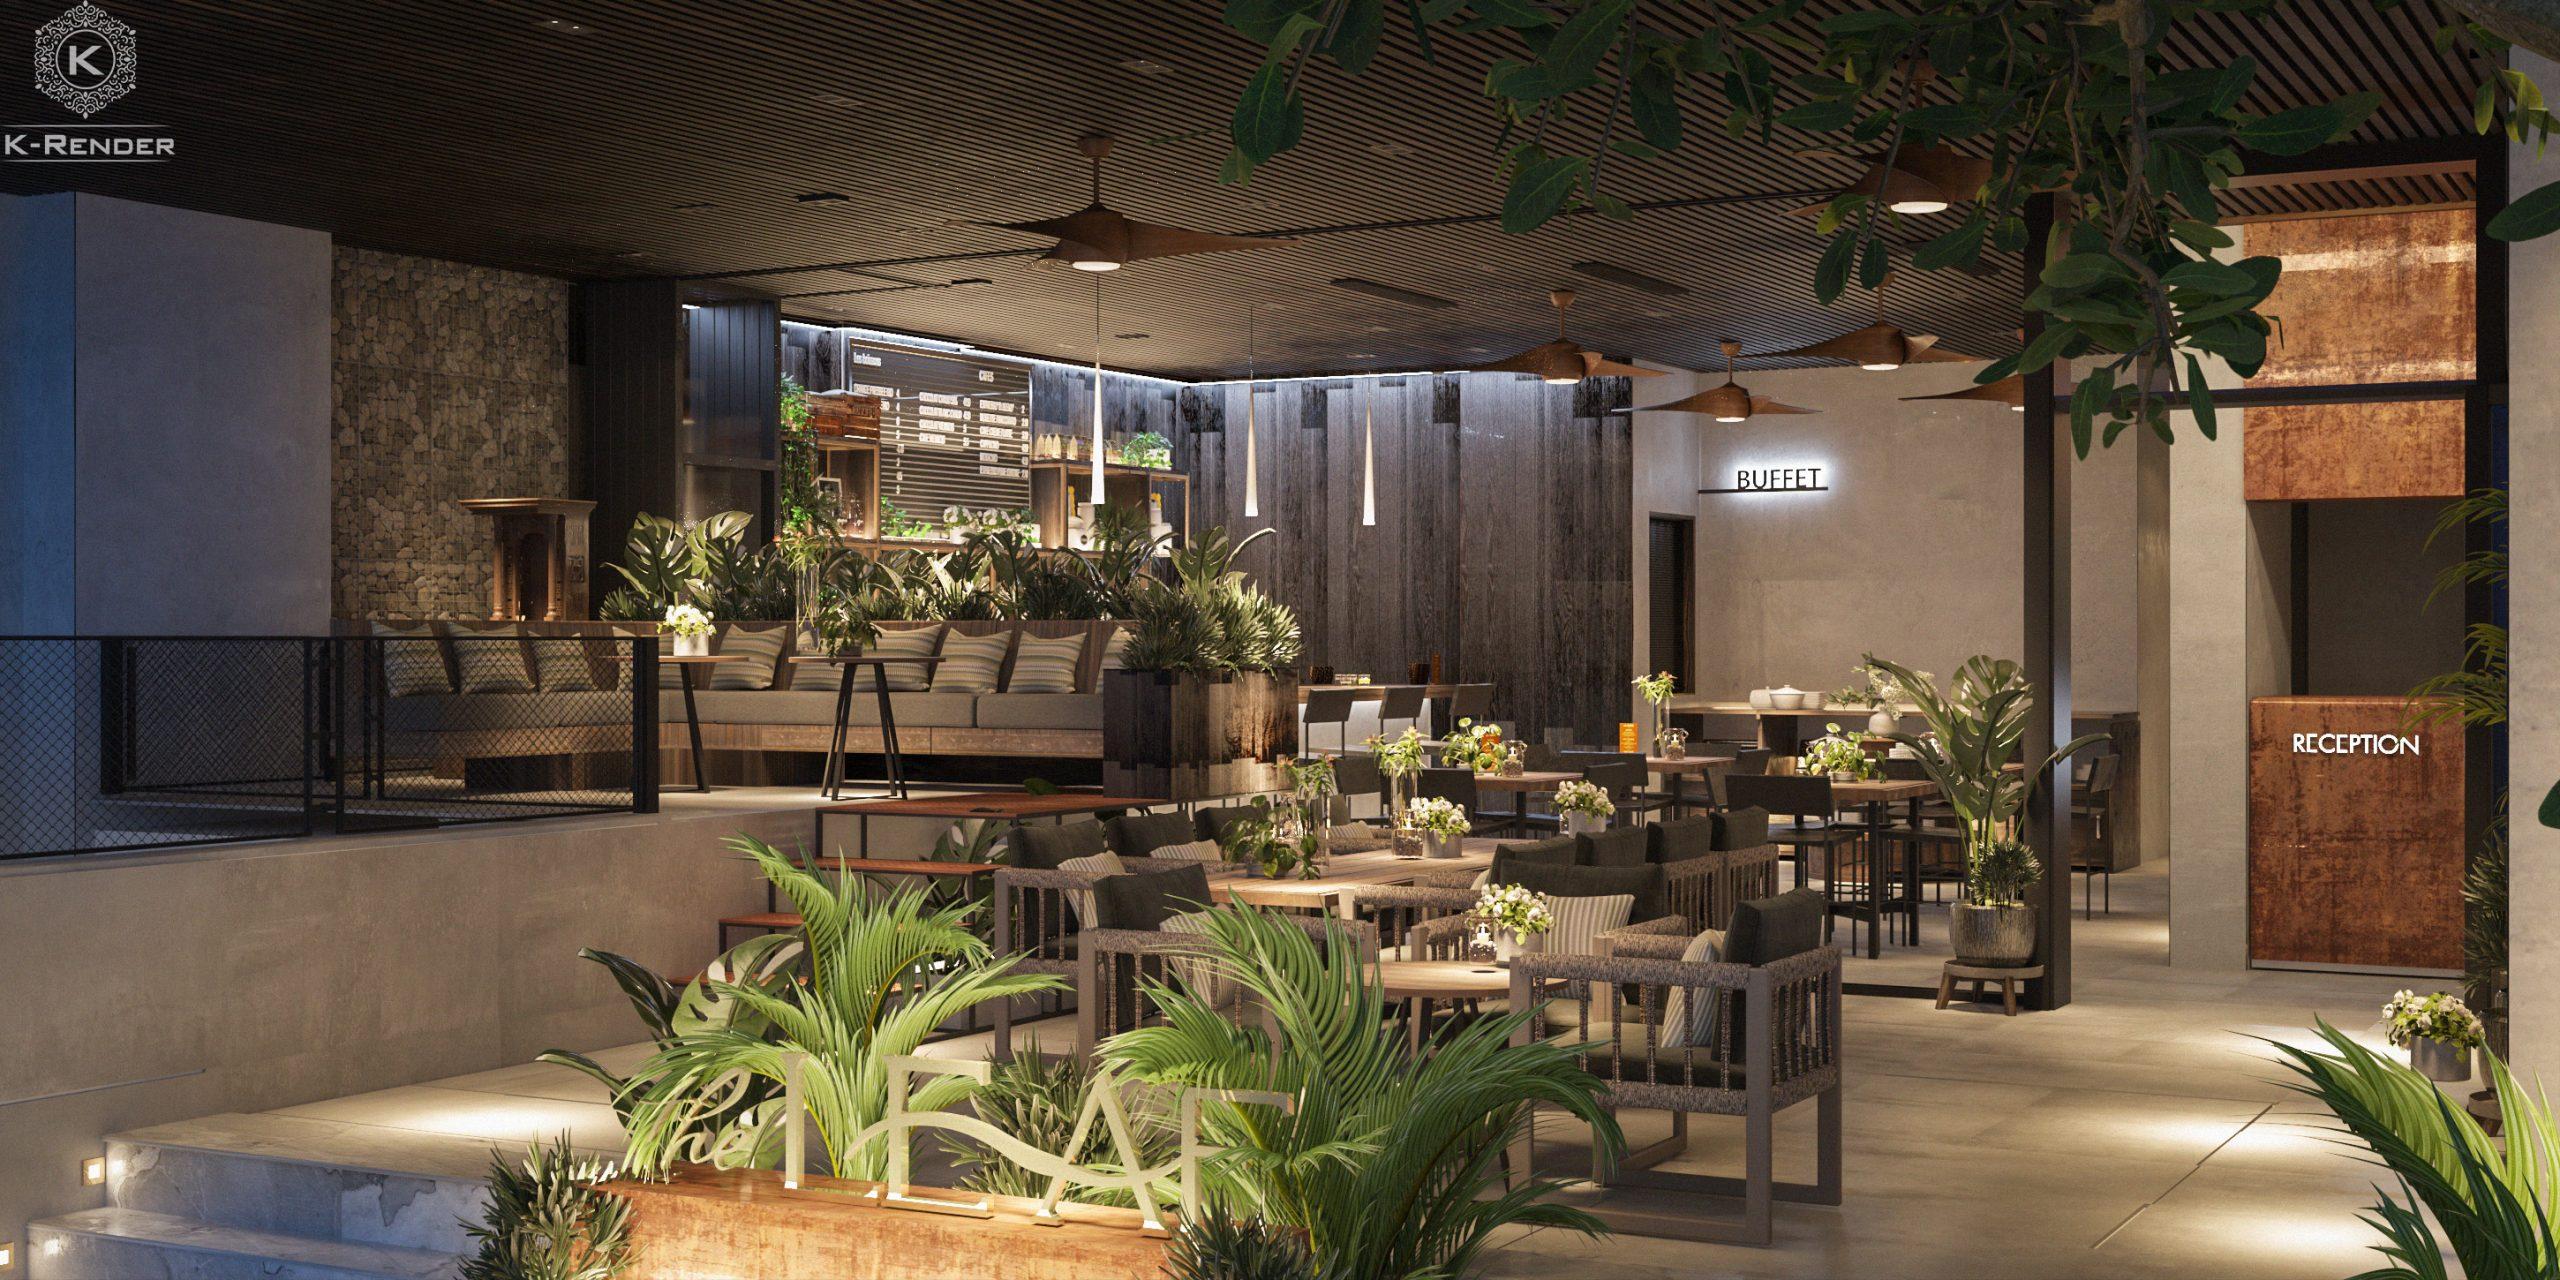 the-summer-bar-and-restaurant-project-k-render-studio-22